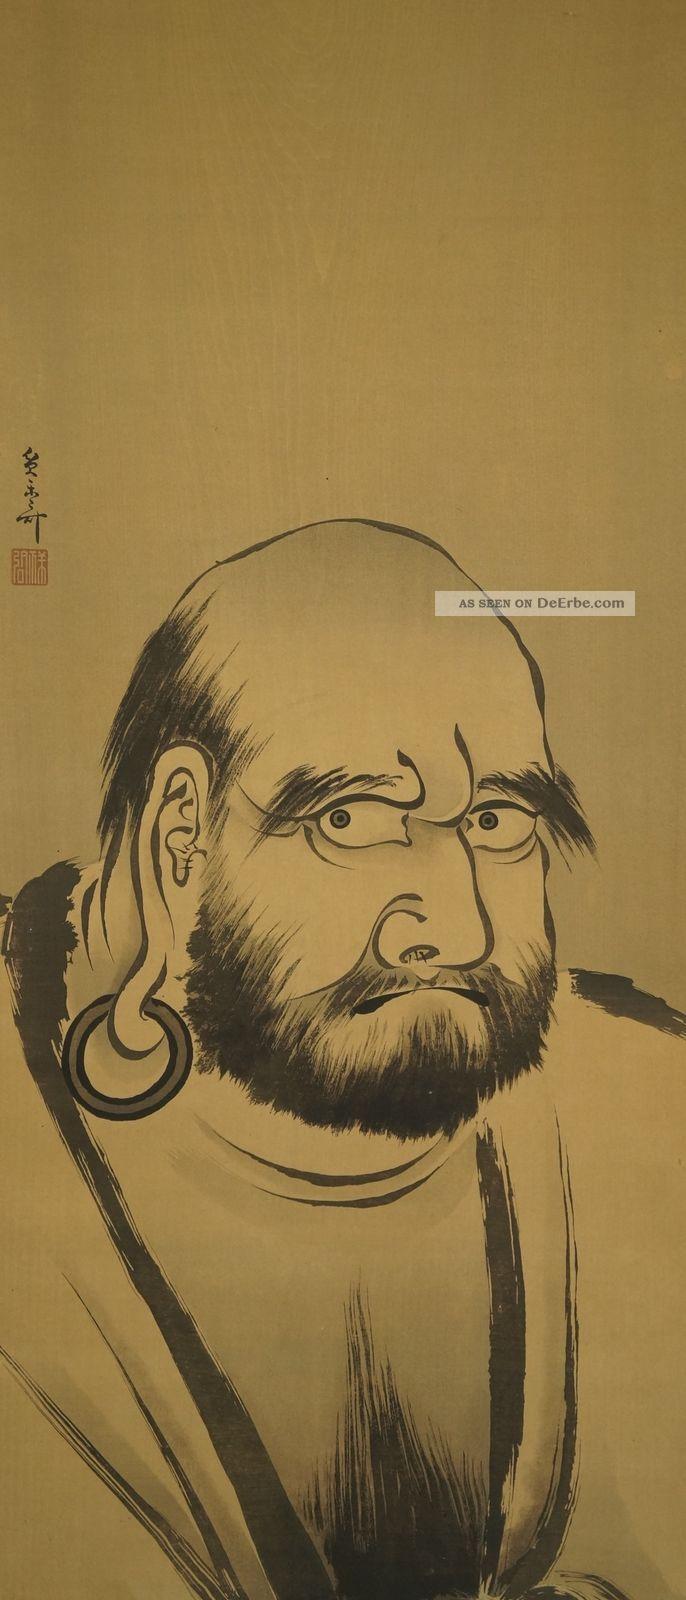 Japanisches Rollbild Kakejiku Kakemono Bodhidharma (daruma) Japan Scroll 3674 Asiatika: Japan Bild